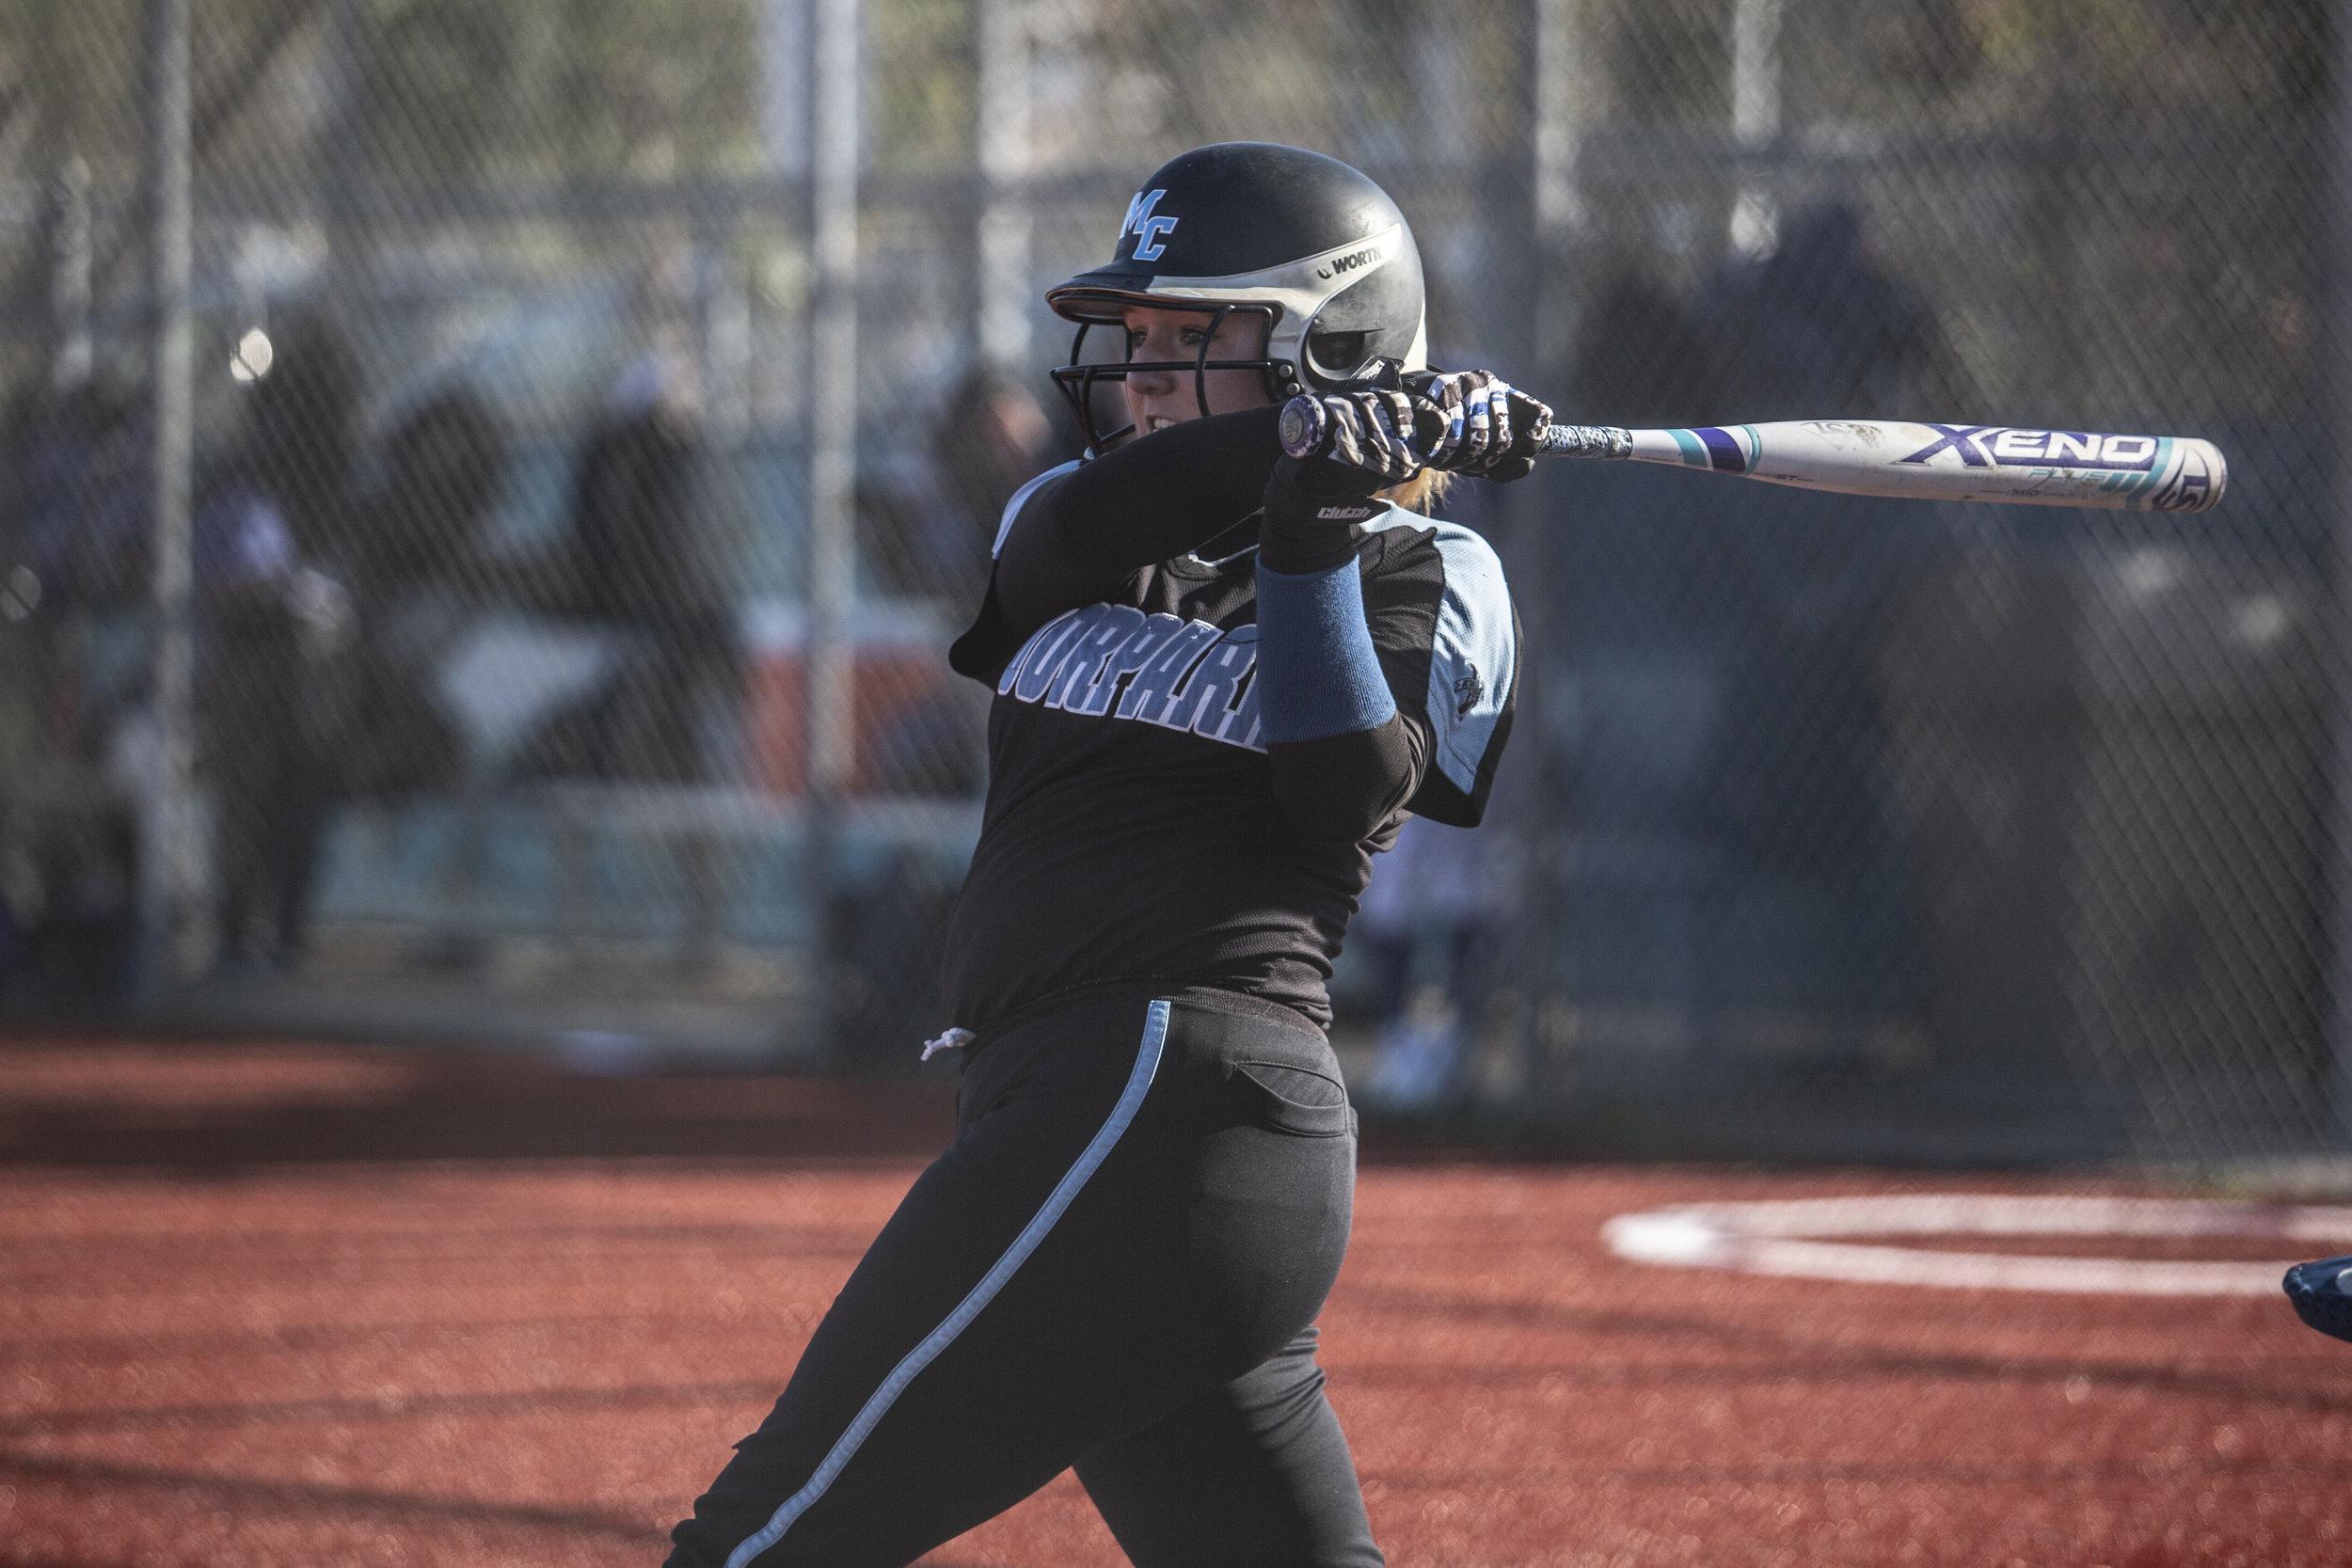 Aubrey Sutherland, from Santa Monica College softball team playing at home vs Moorpark team, Thursday, March 7, 2019 in Santa Monica, Calif.